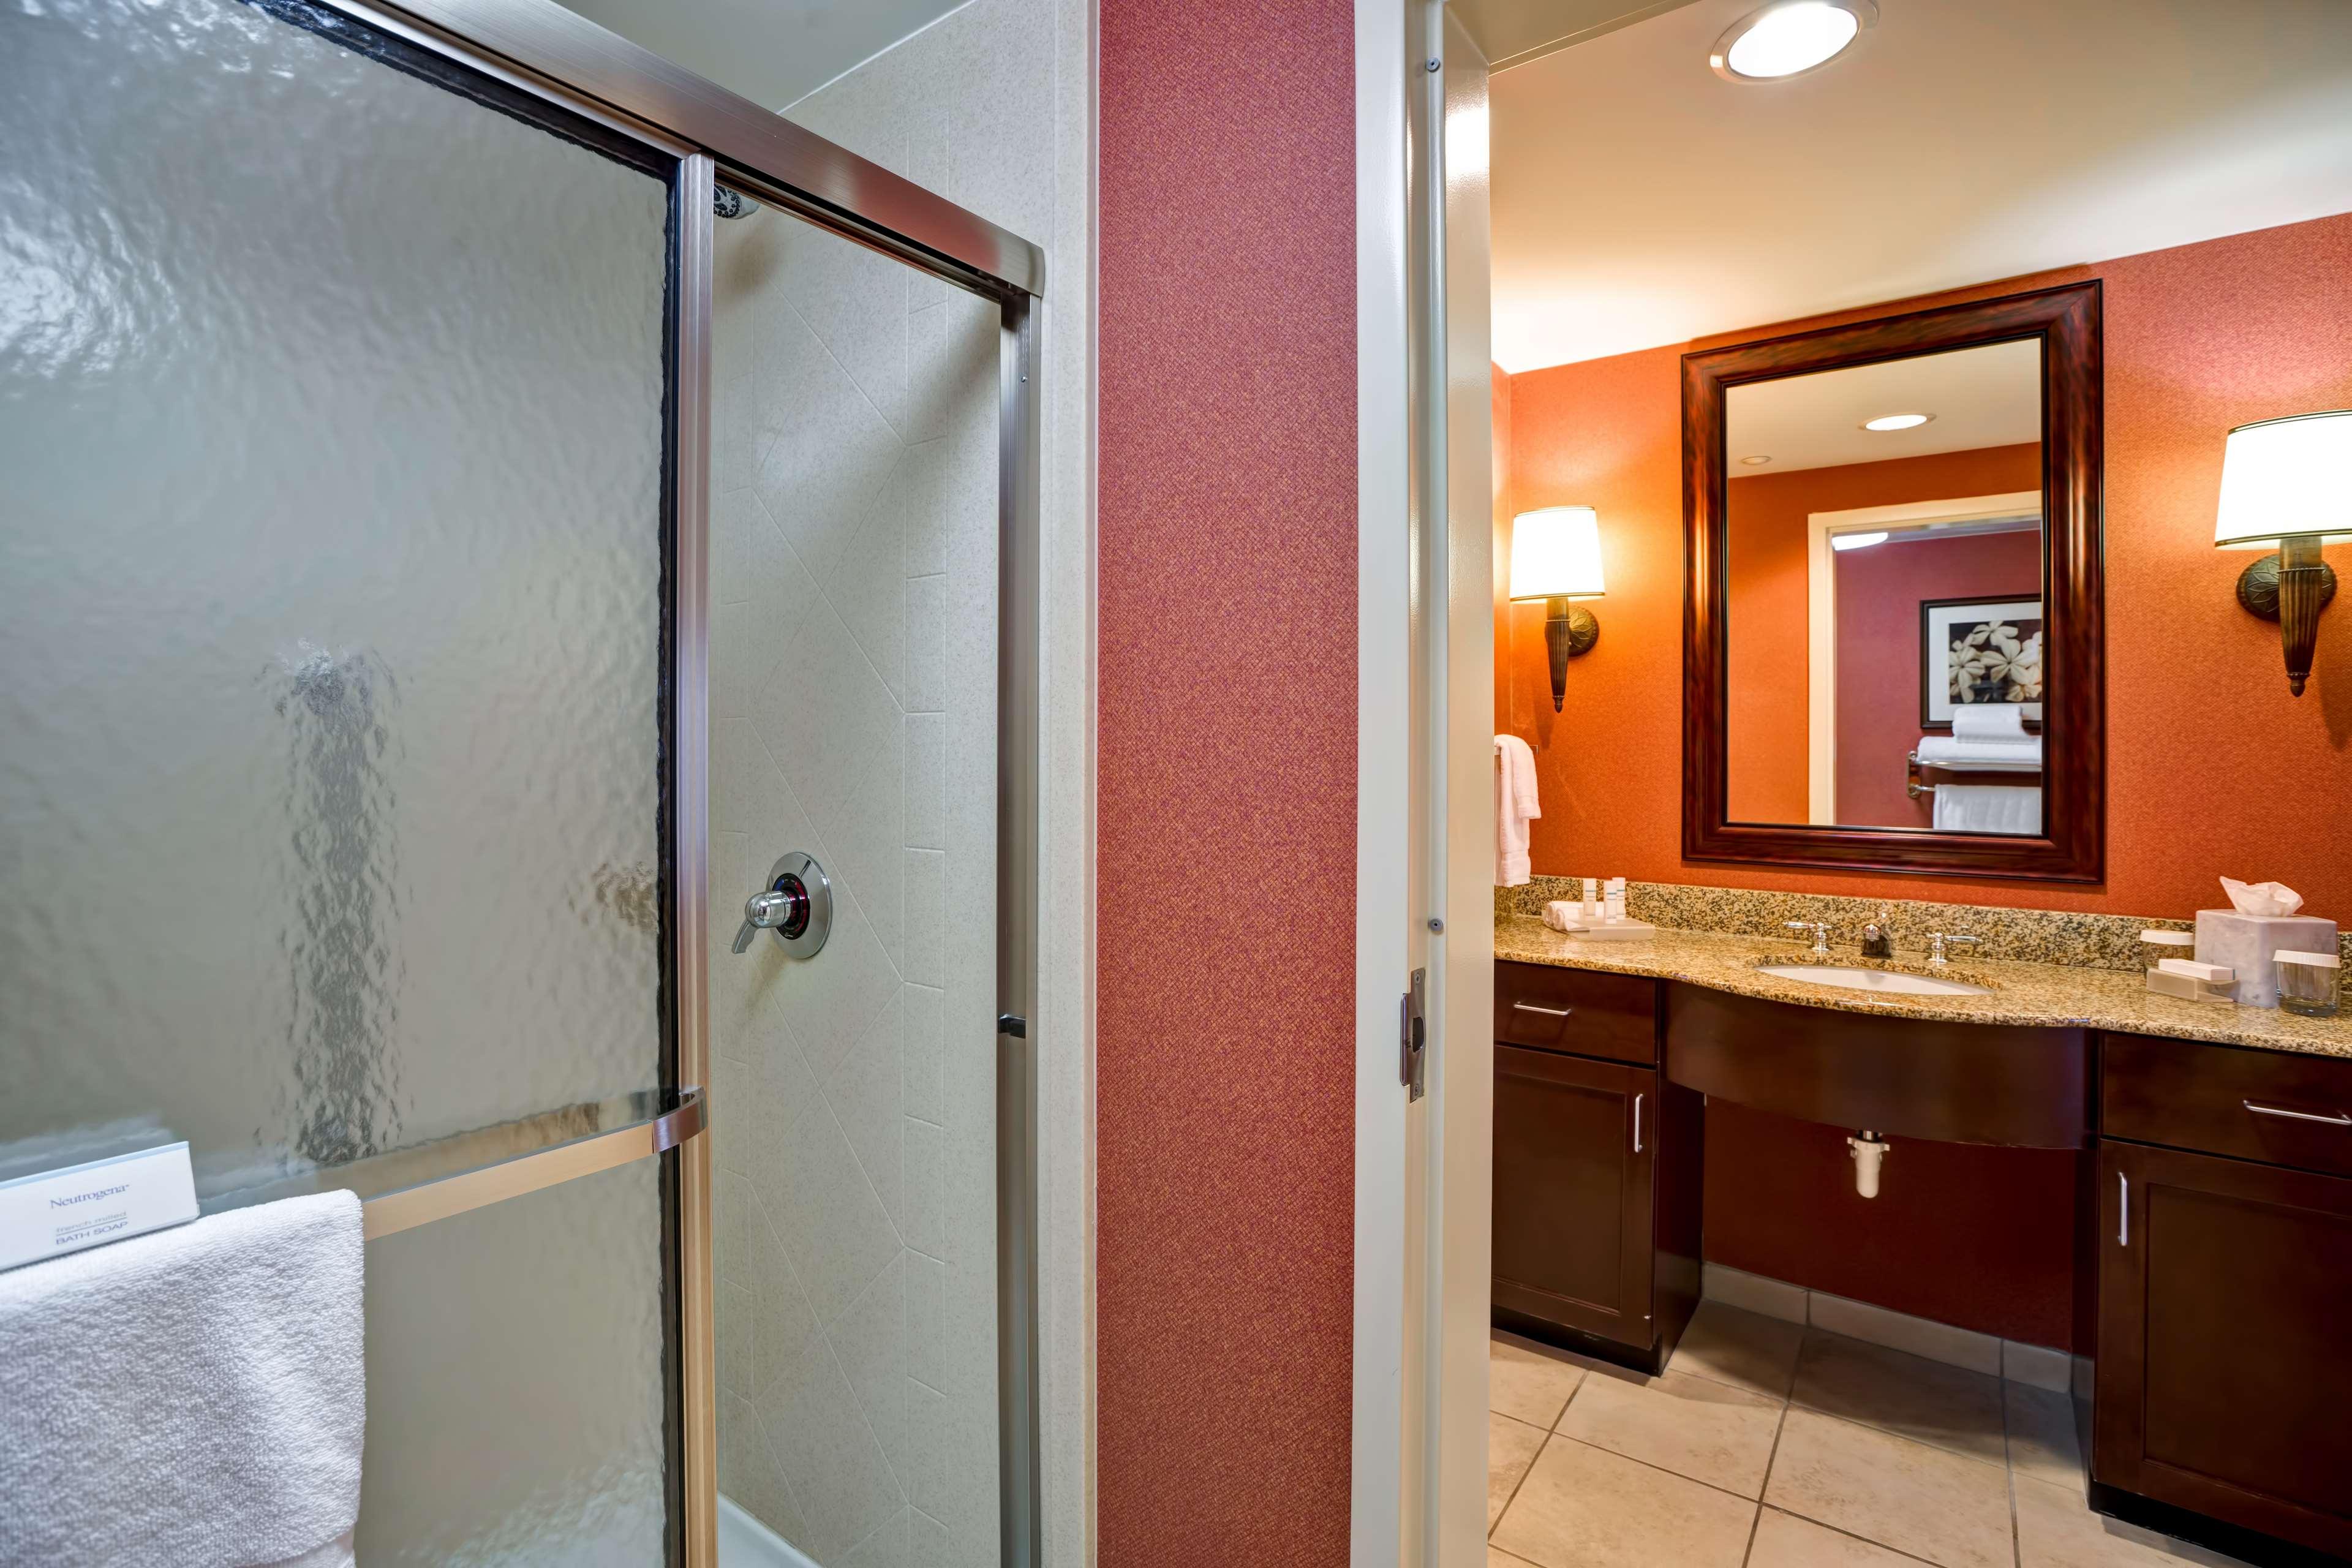 Homewood Suites by Hilton Fredericksburg image 24